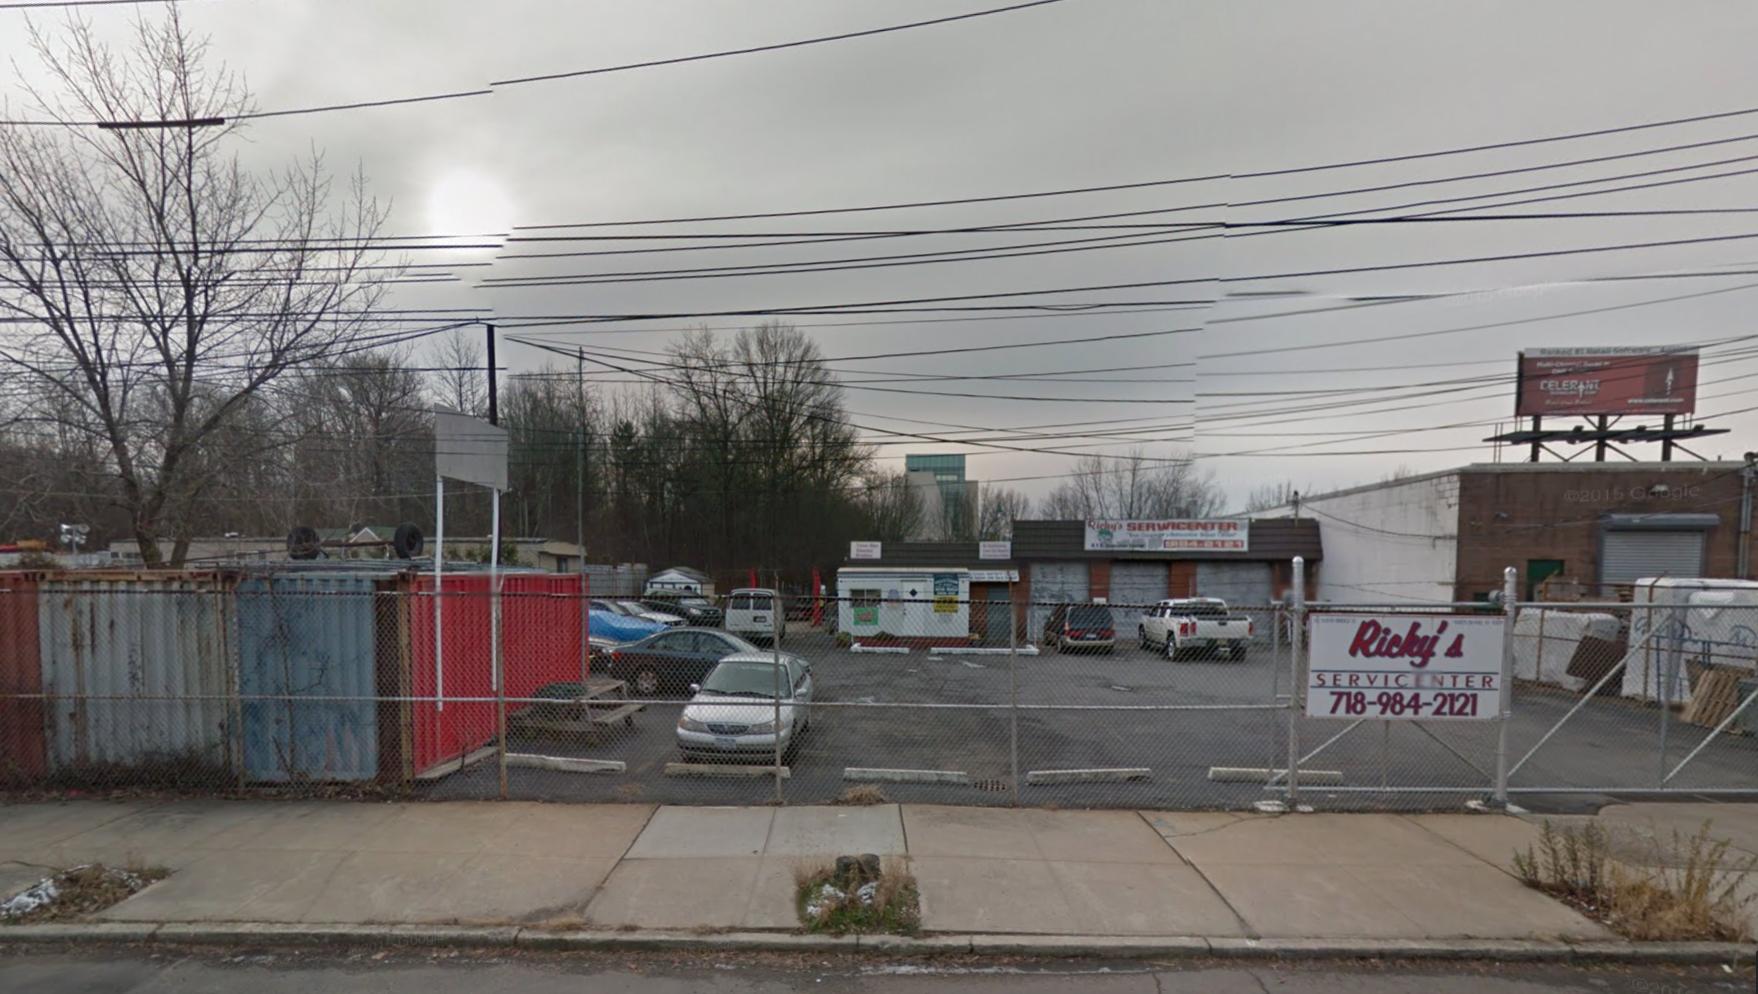 110 South Bridge Street, image via Google Maps